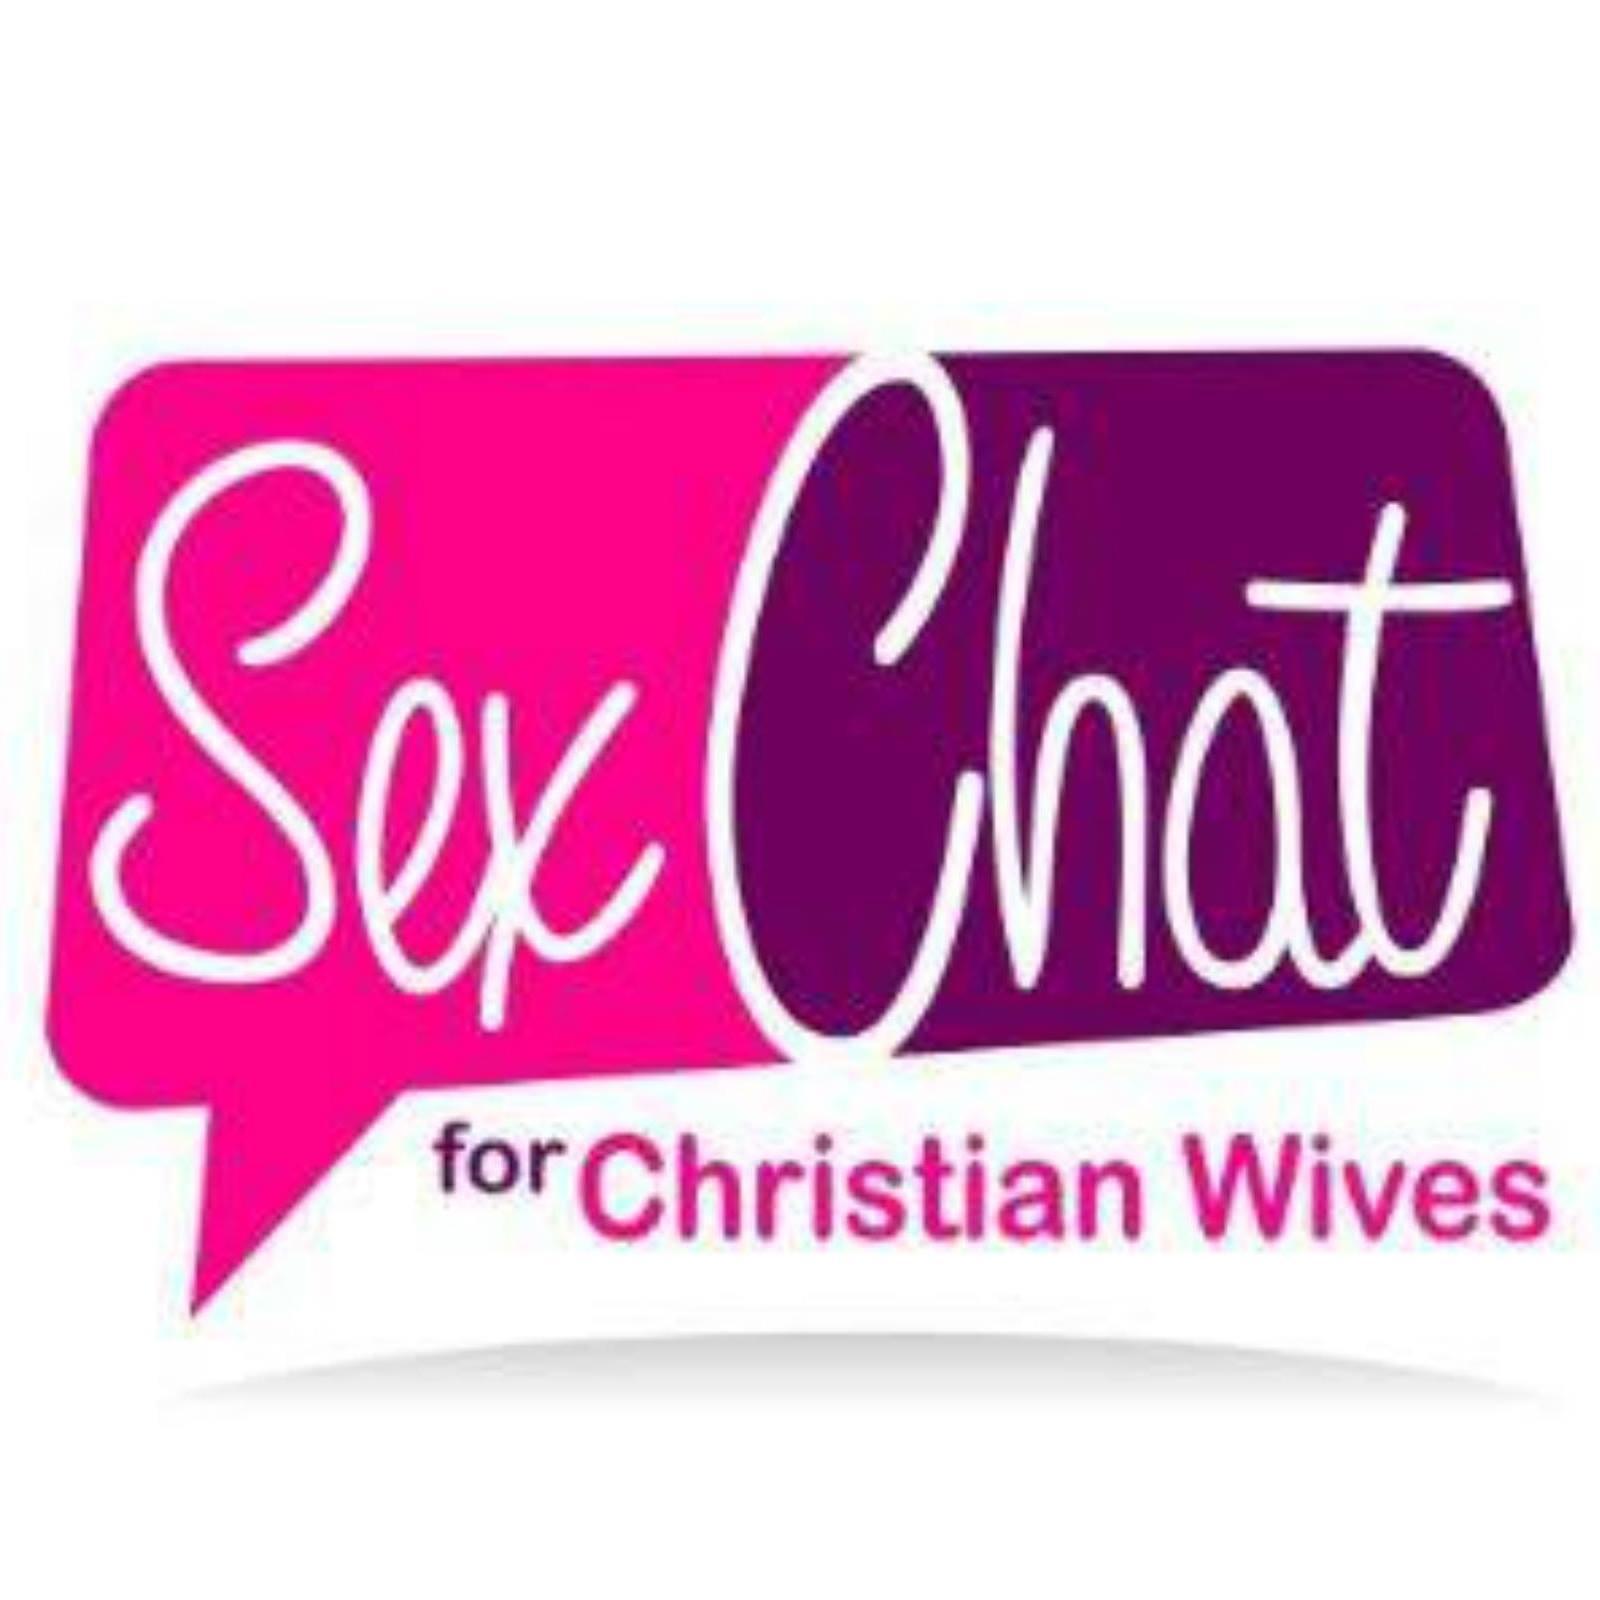 Avatar sex chat